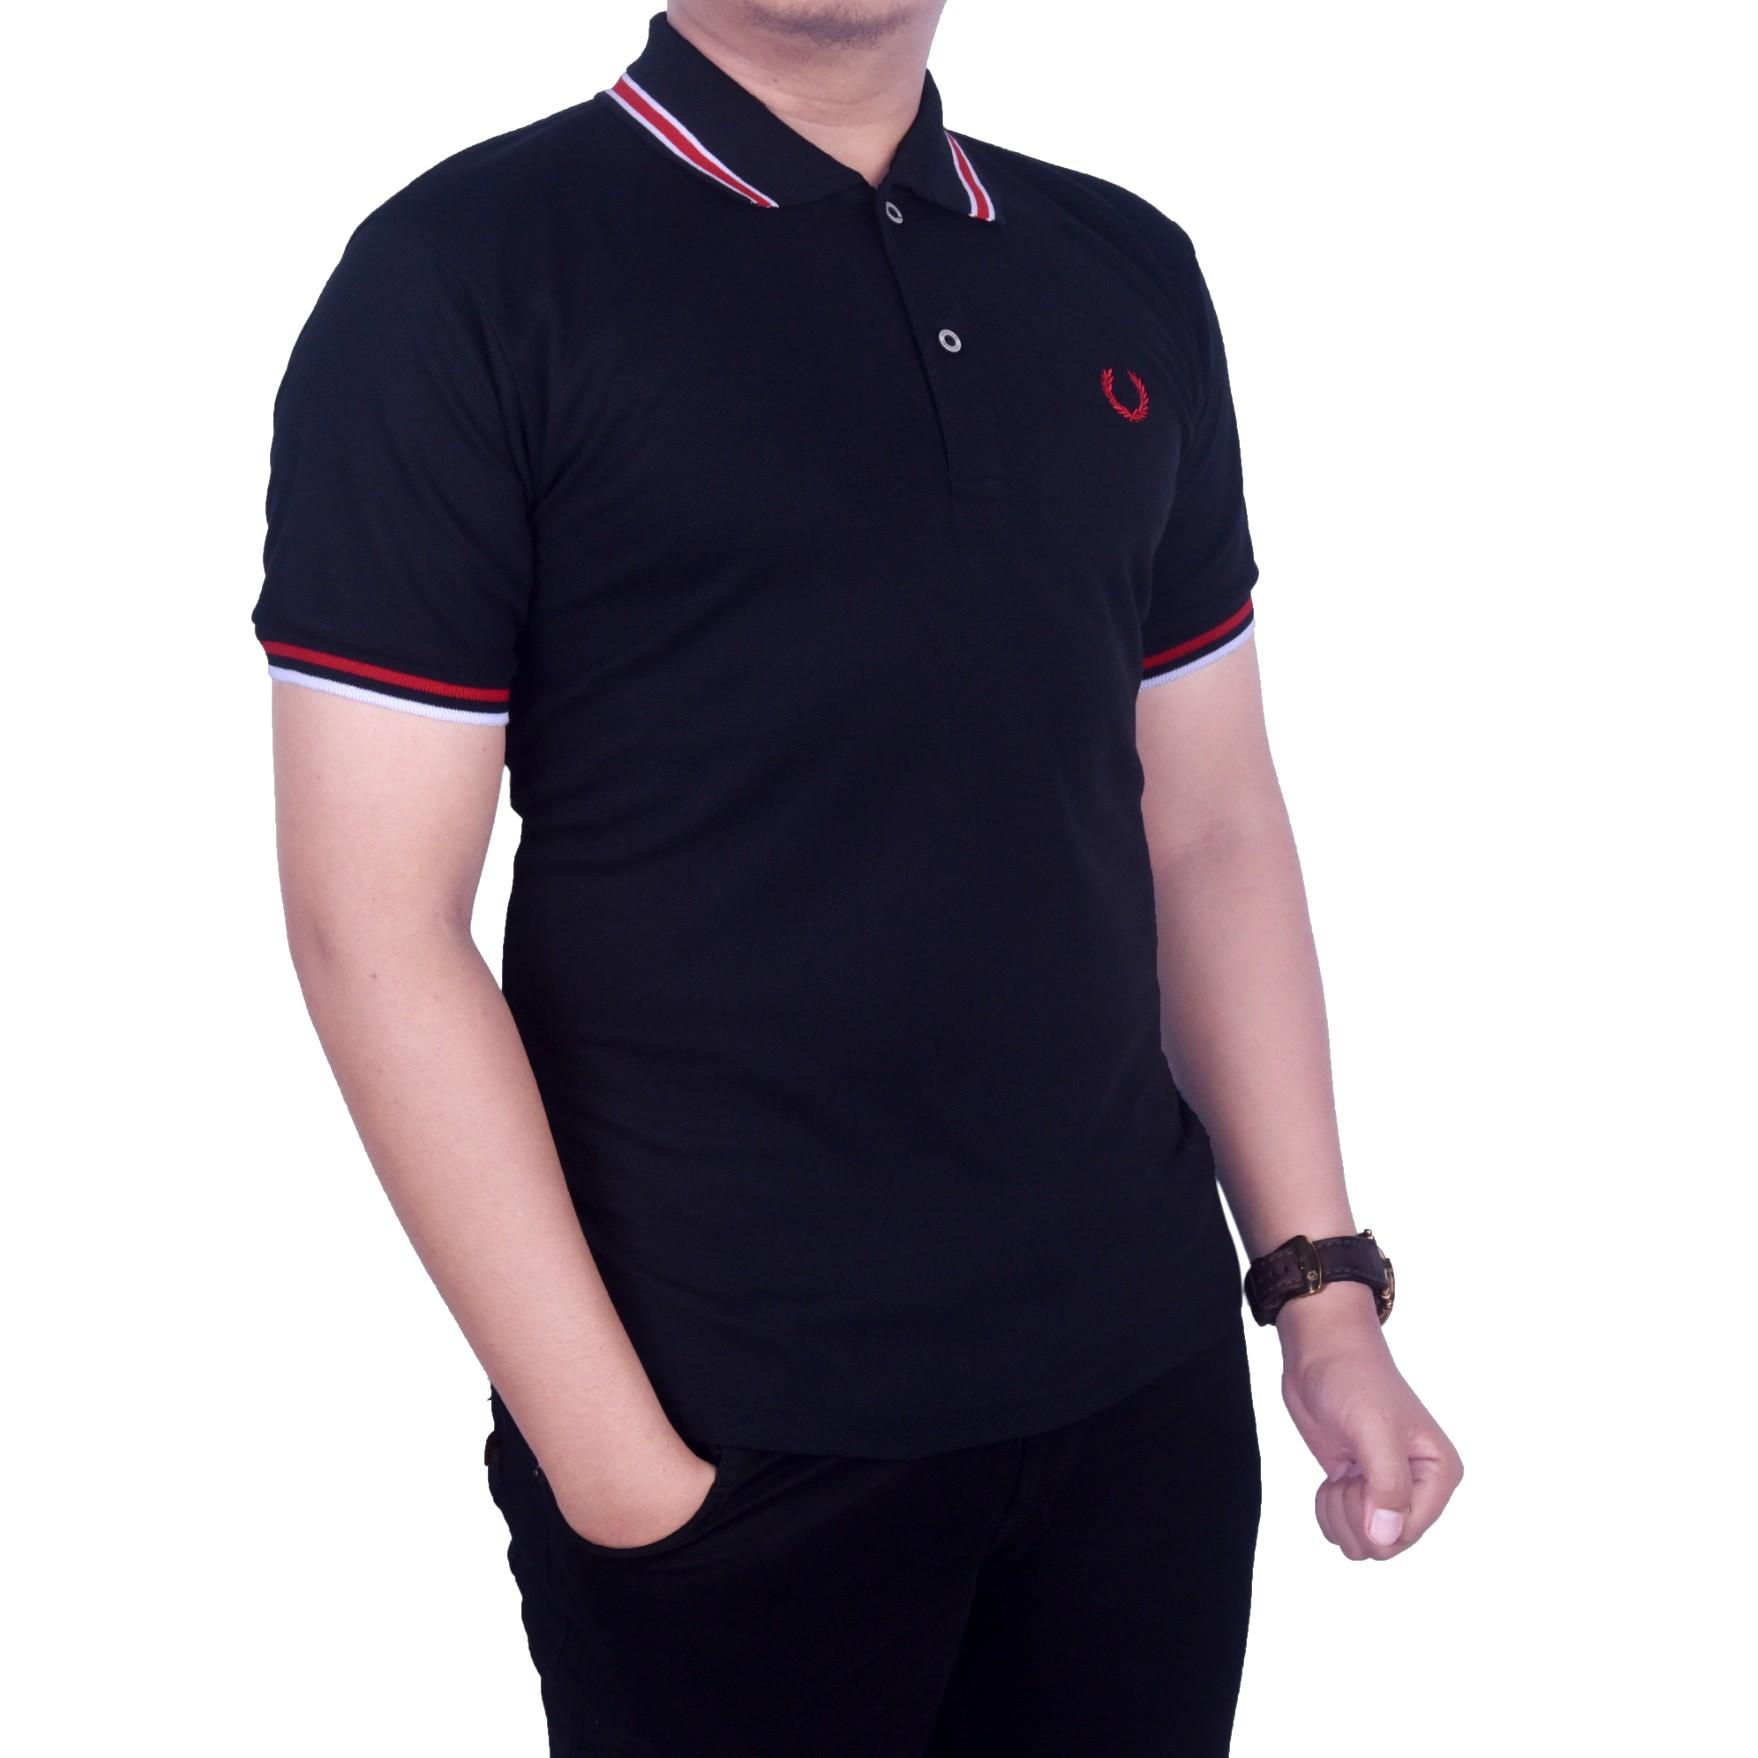 Dgm_Fashion1 Polo Kaos Pria Polos Best Seller Baju Polo Krah Sanghai/ PoloShirt Man/Polo